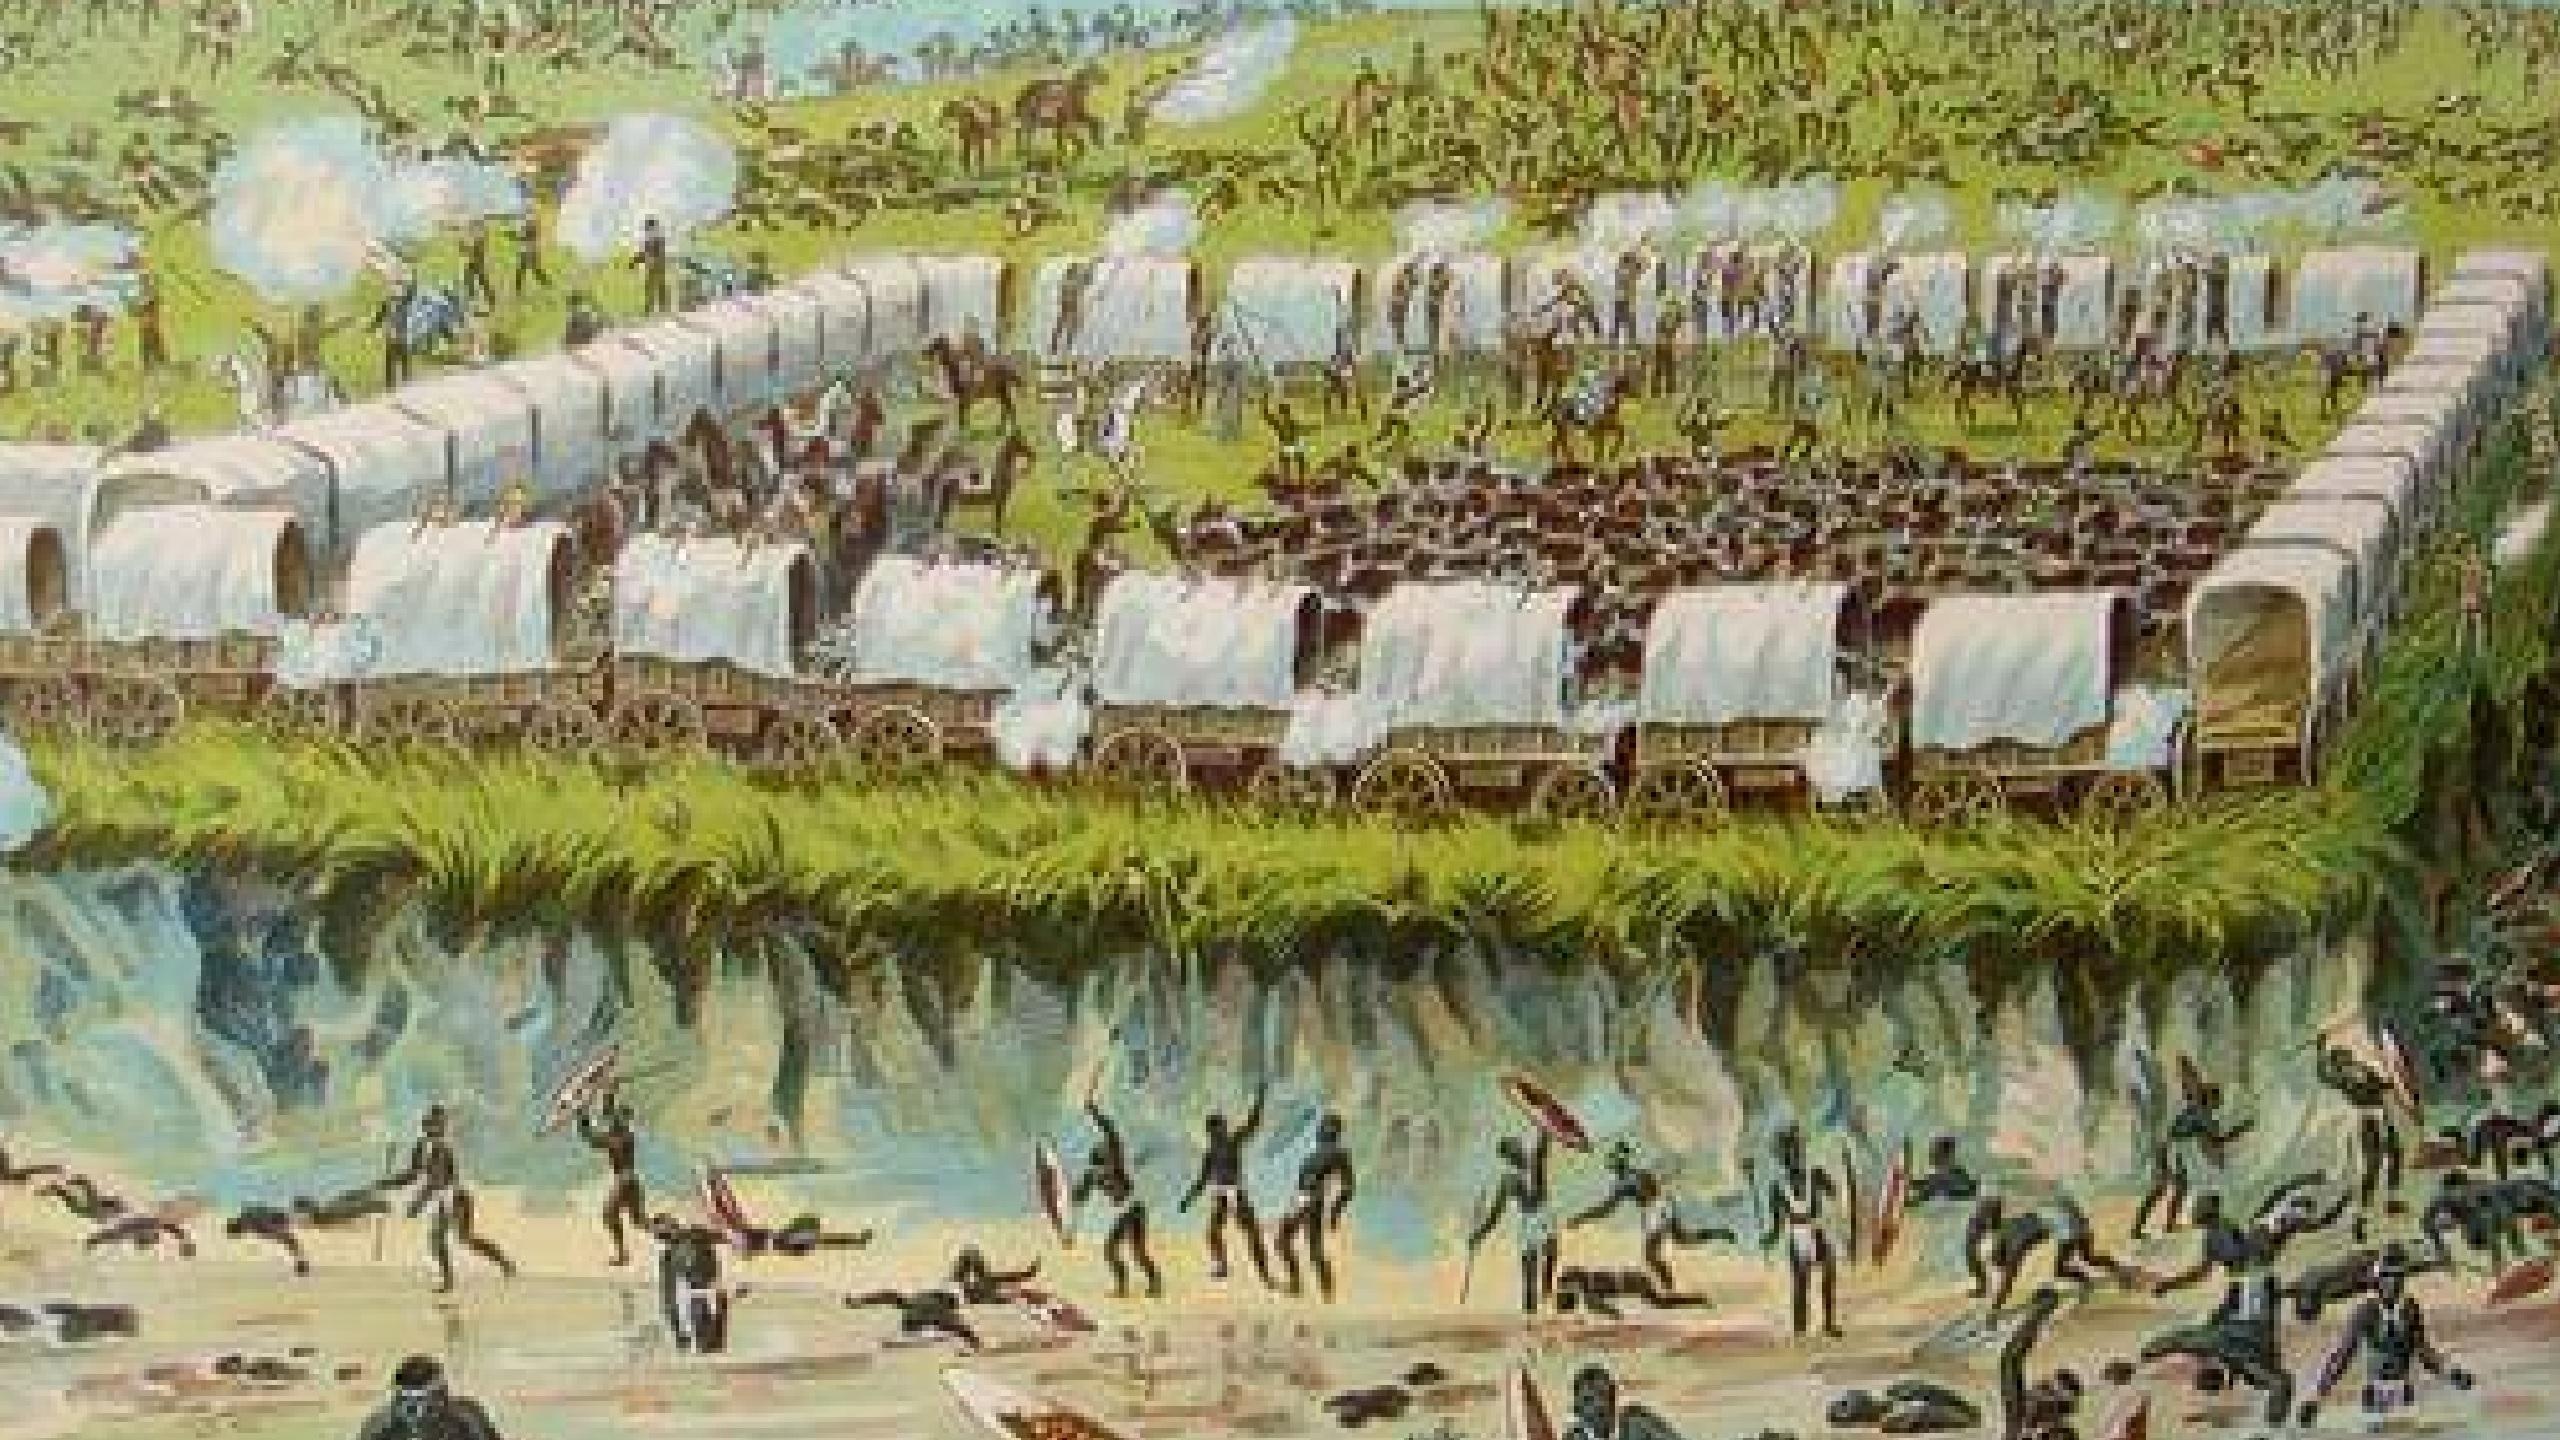 Zulu attack on Ox Cart Wagon